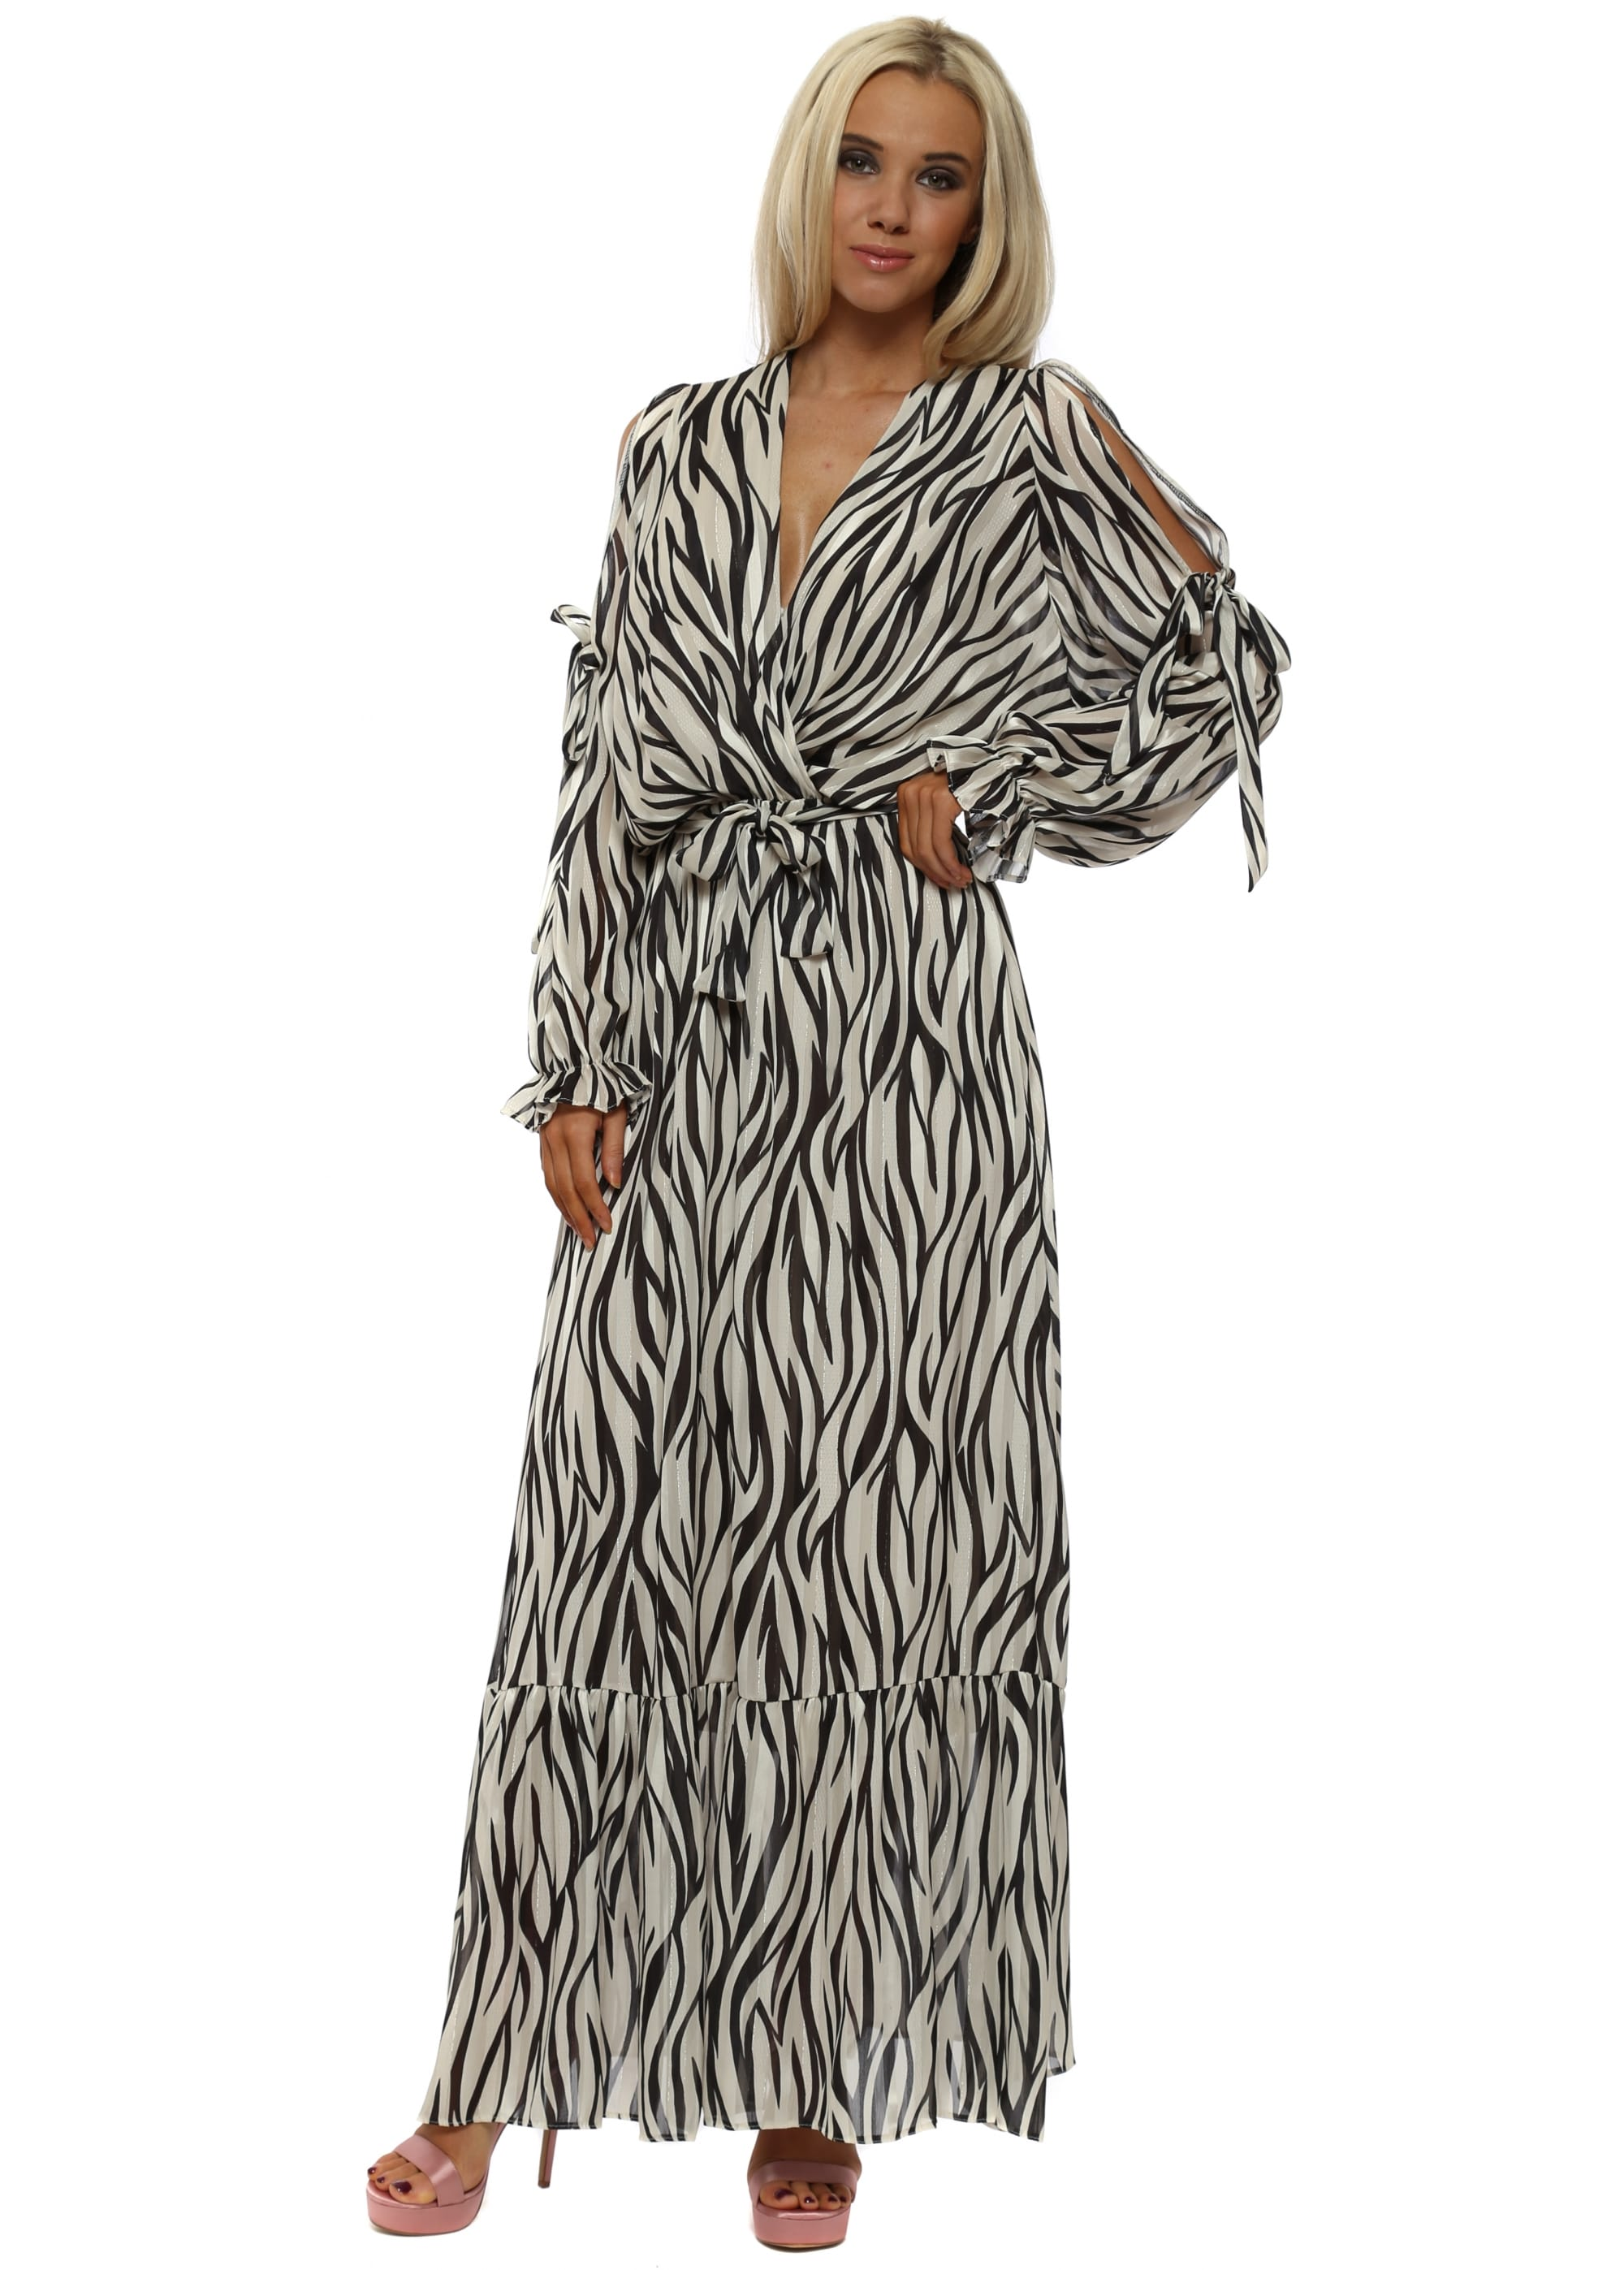 Zebra Print Cross Over Maxi Dress 5b8c8c0c6